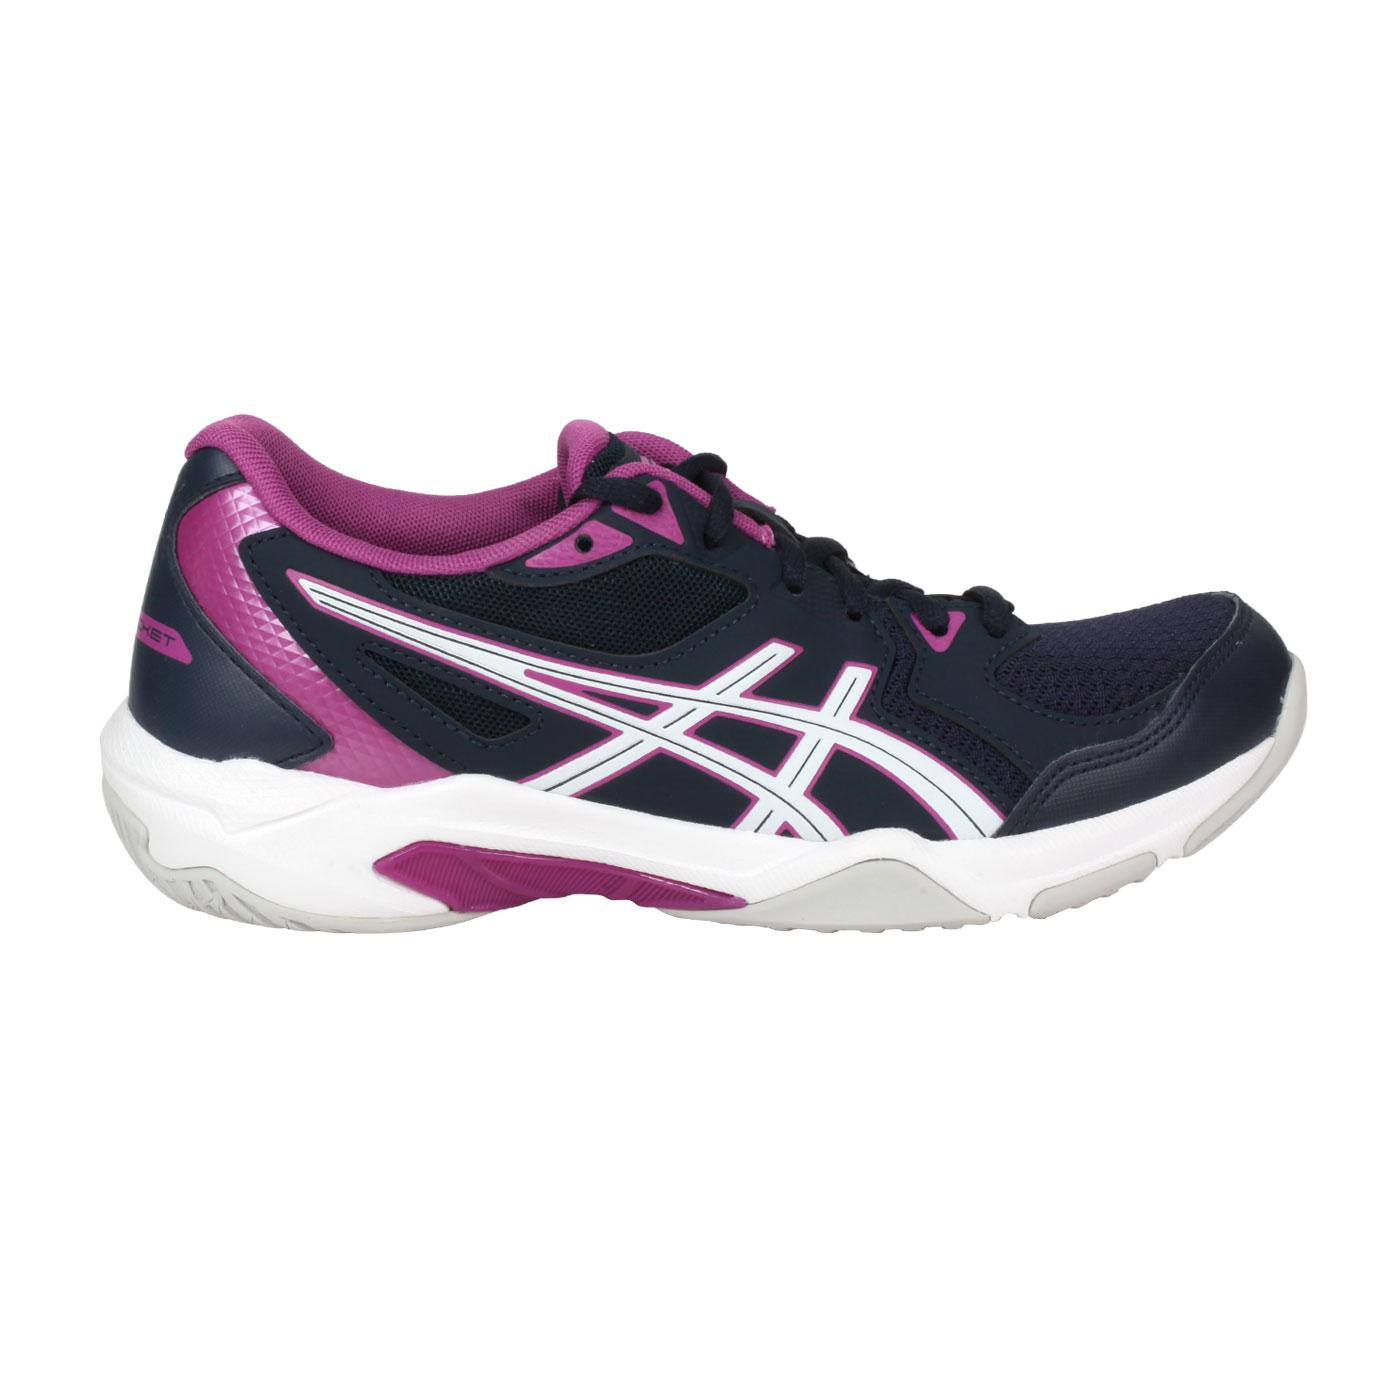 ASICS 女款排羽球鞋  @GEL-ROCKET 10@1072A056-400 - 丈青白紫